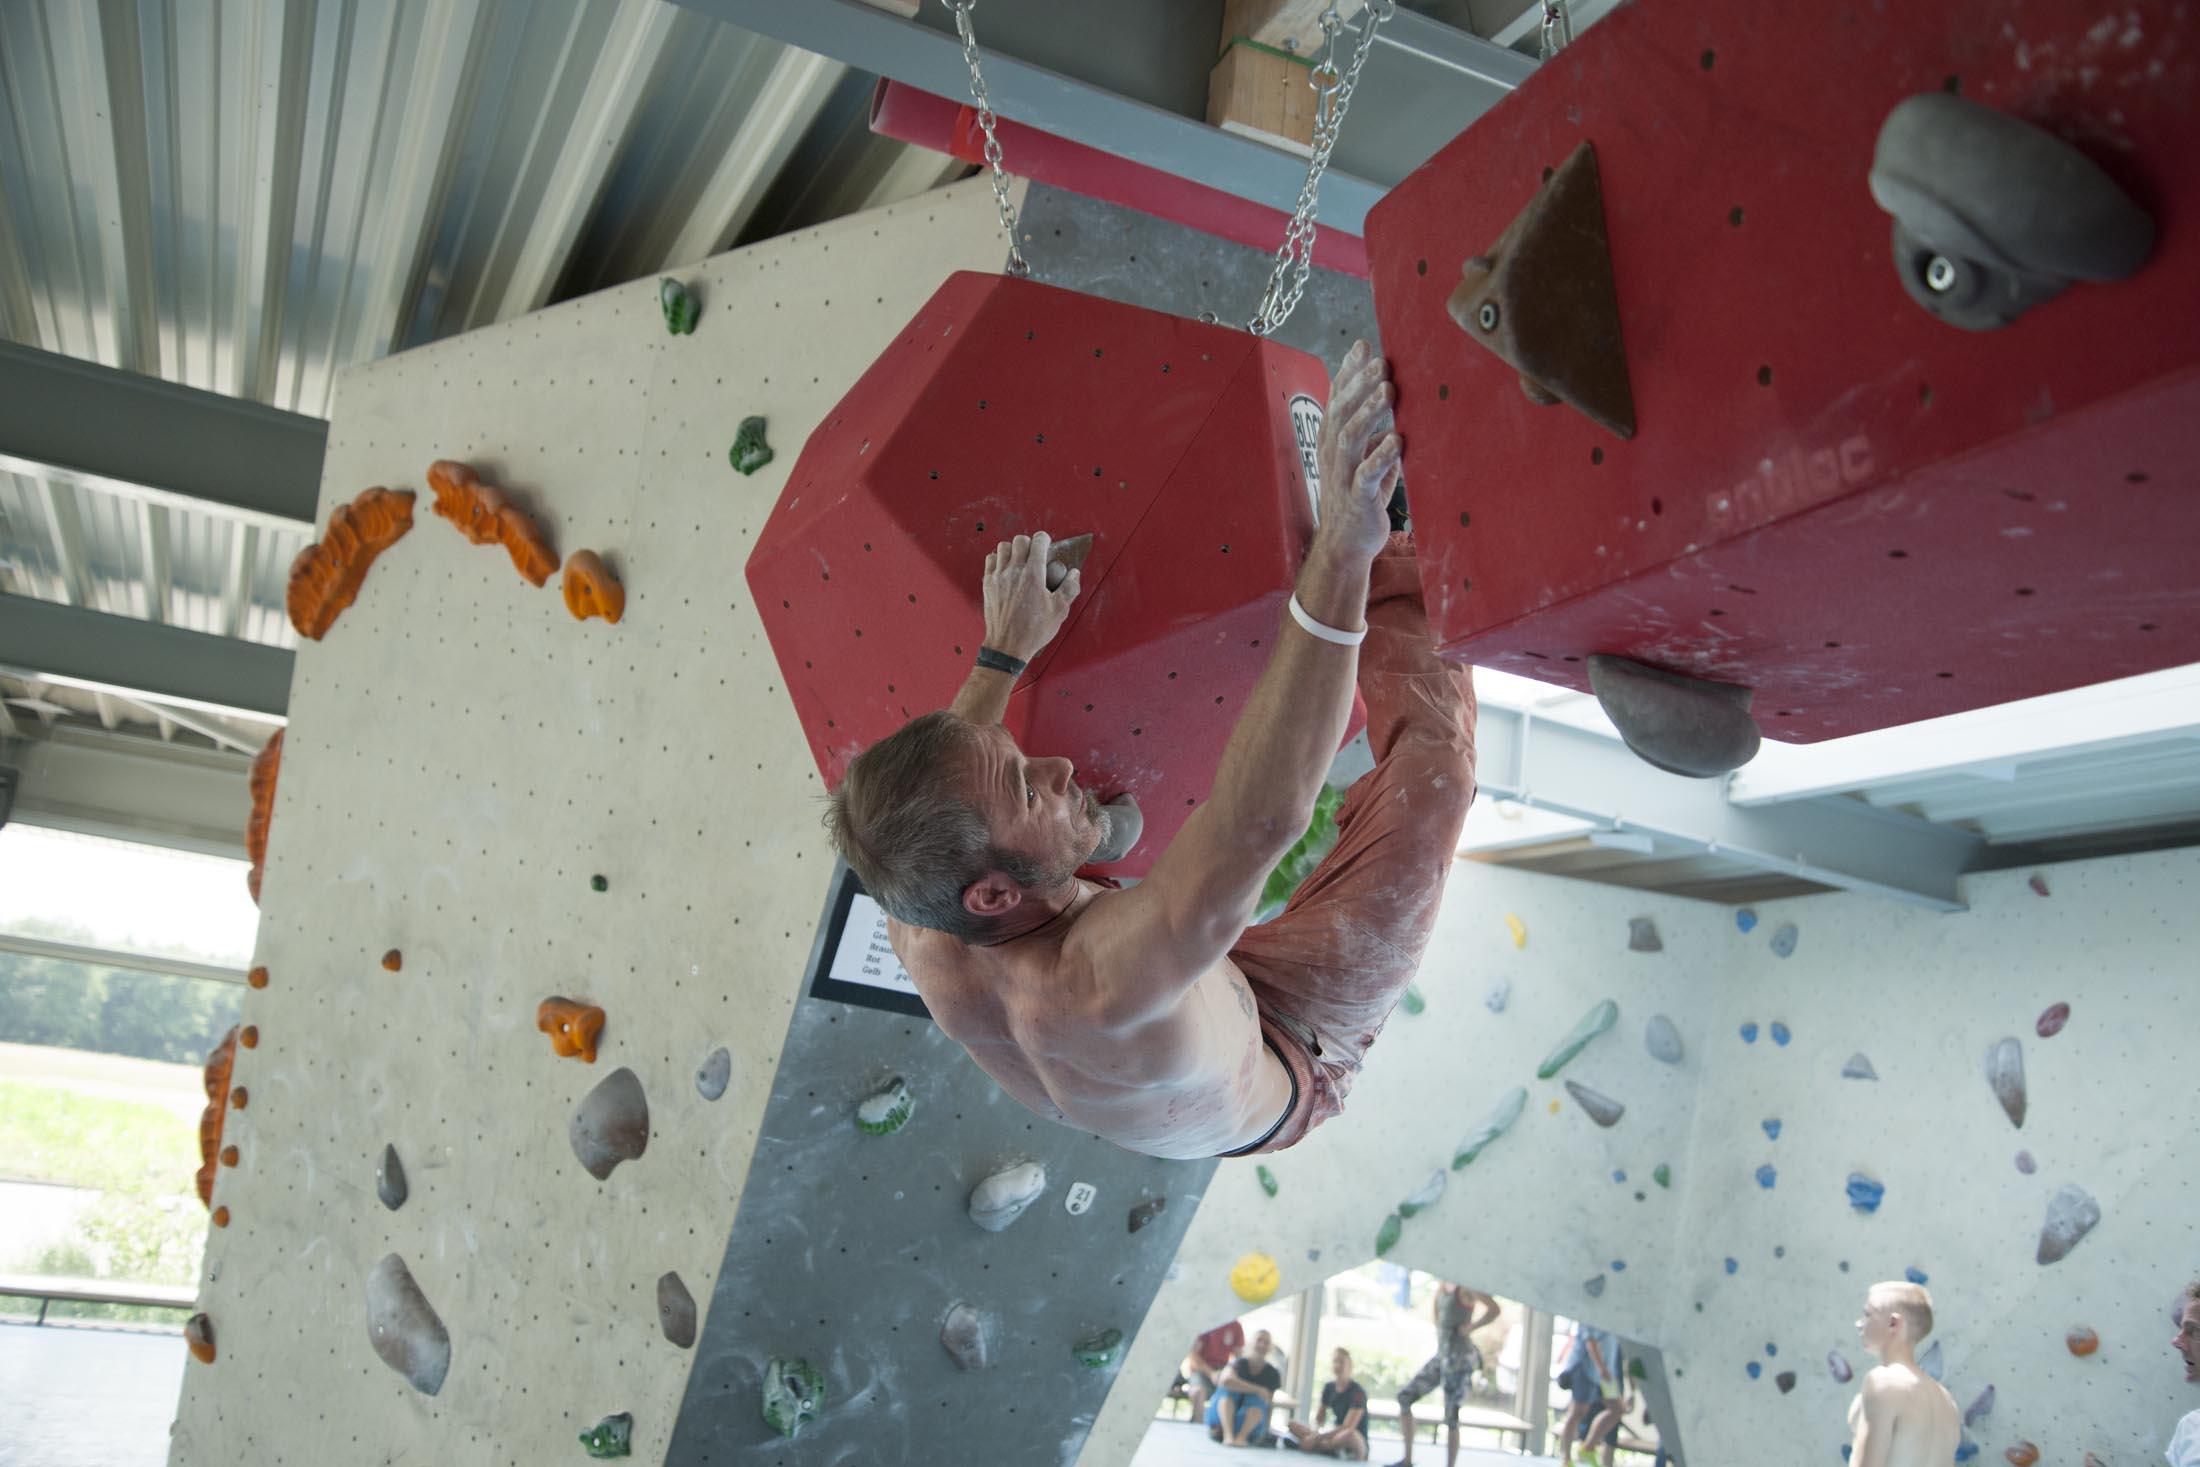 Quali, internationaler bouldercup Frankenjura 2016, BLOCKHELDEN Erlangen, Mammut, Bergfreunde.de, Boulderwettkampf07092016226